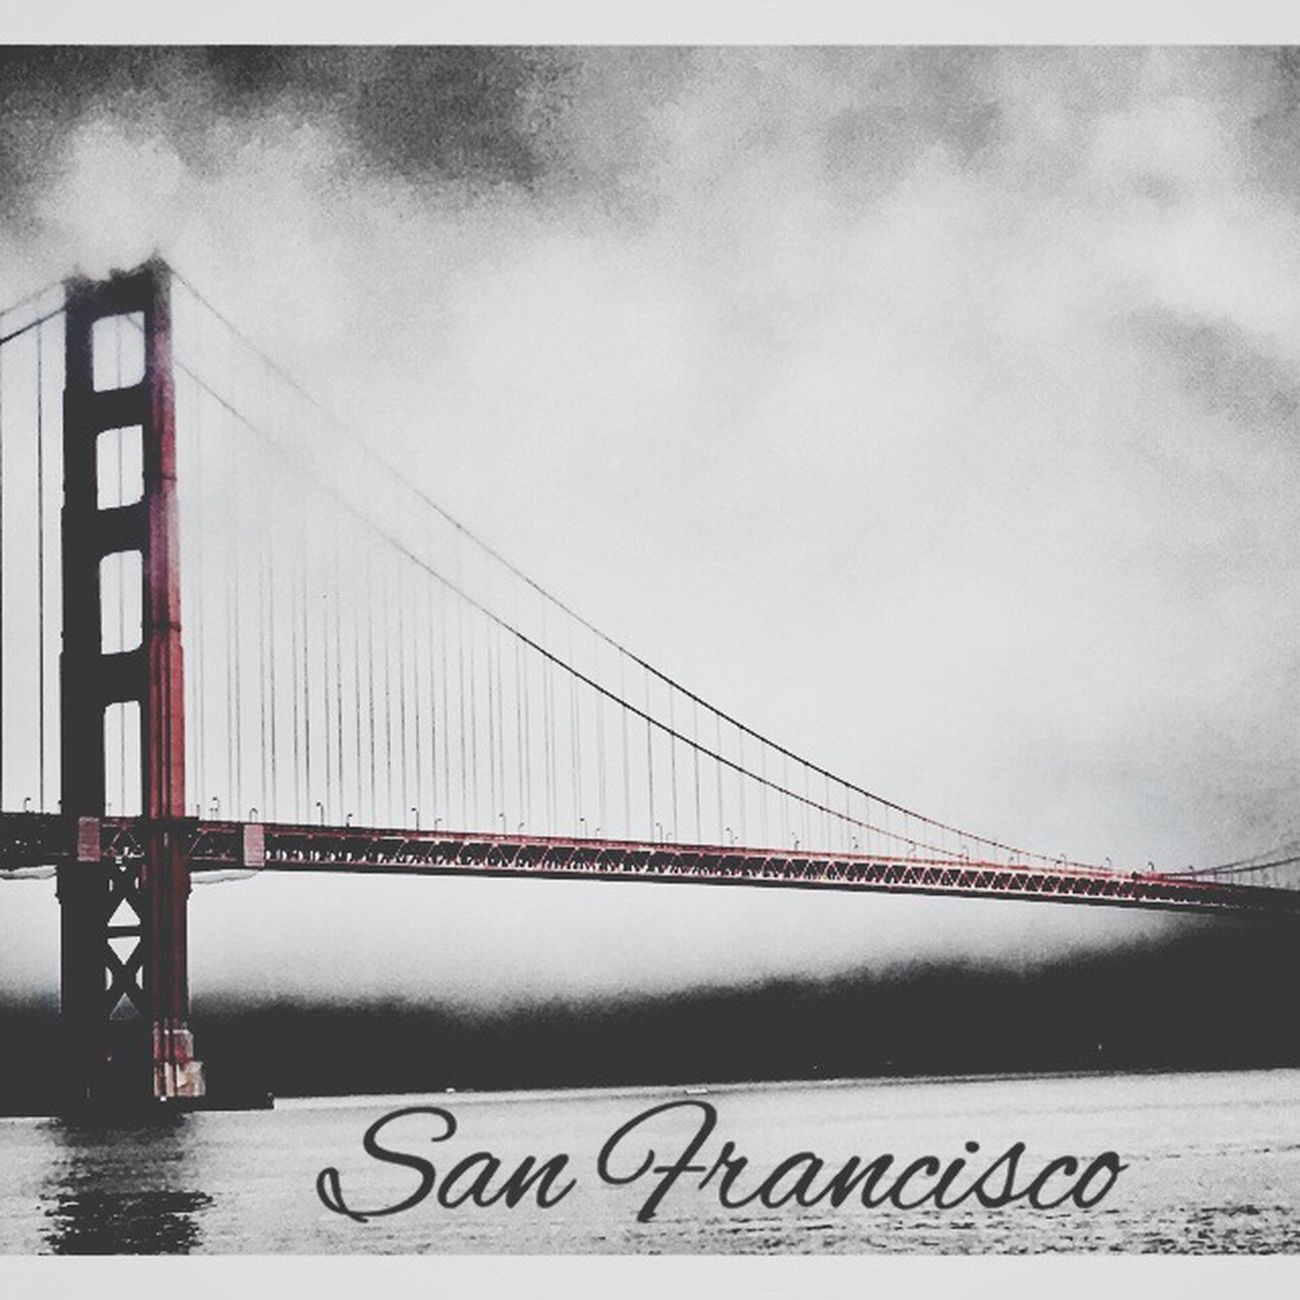 Bay Area Yee San Francisco California Golden Gate Bridge EyeEm Gallery Eye4photography  Randomshot